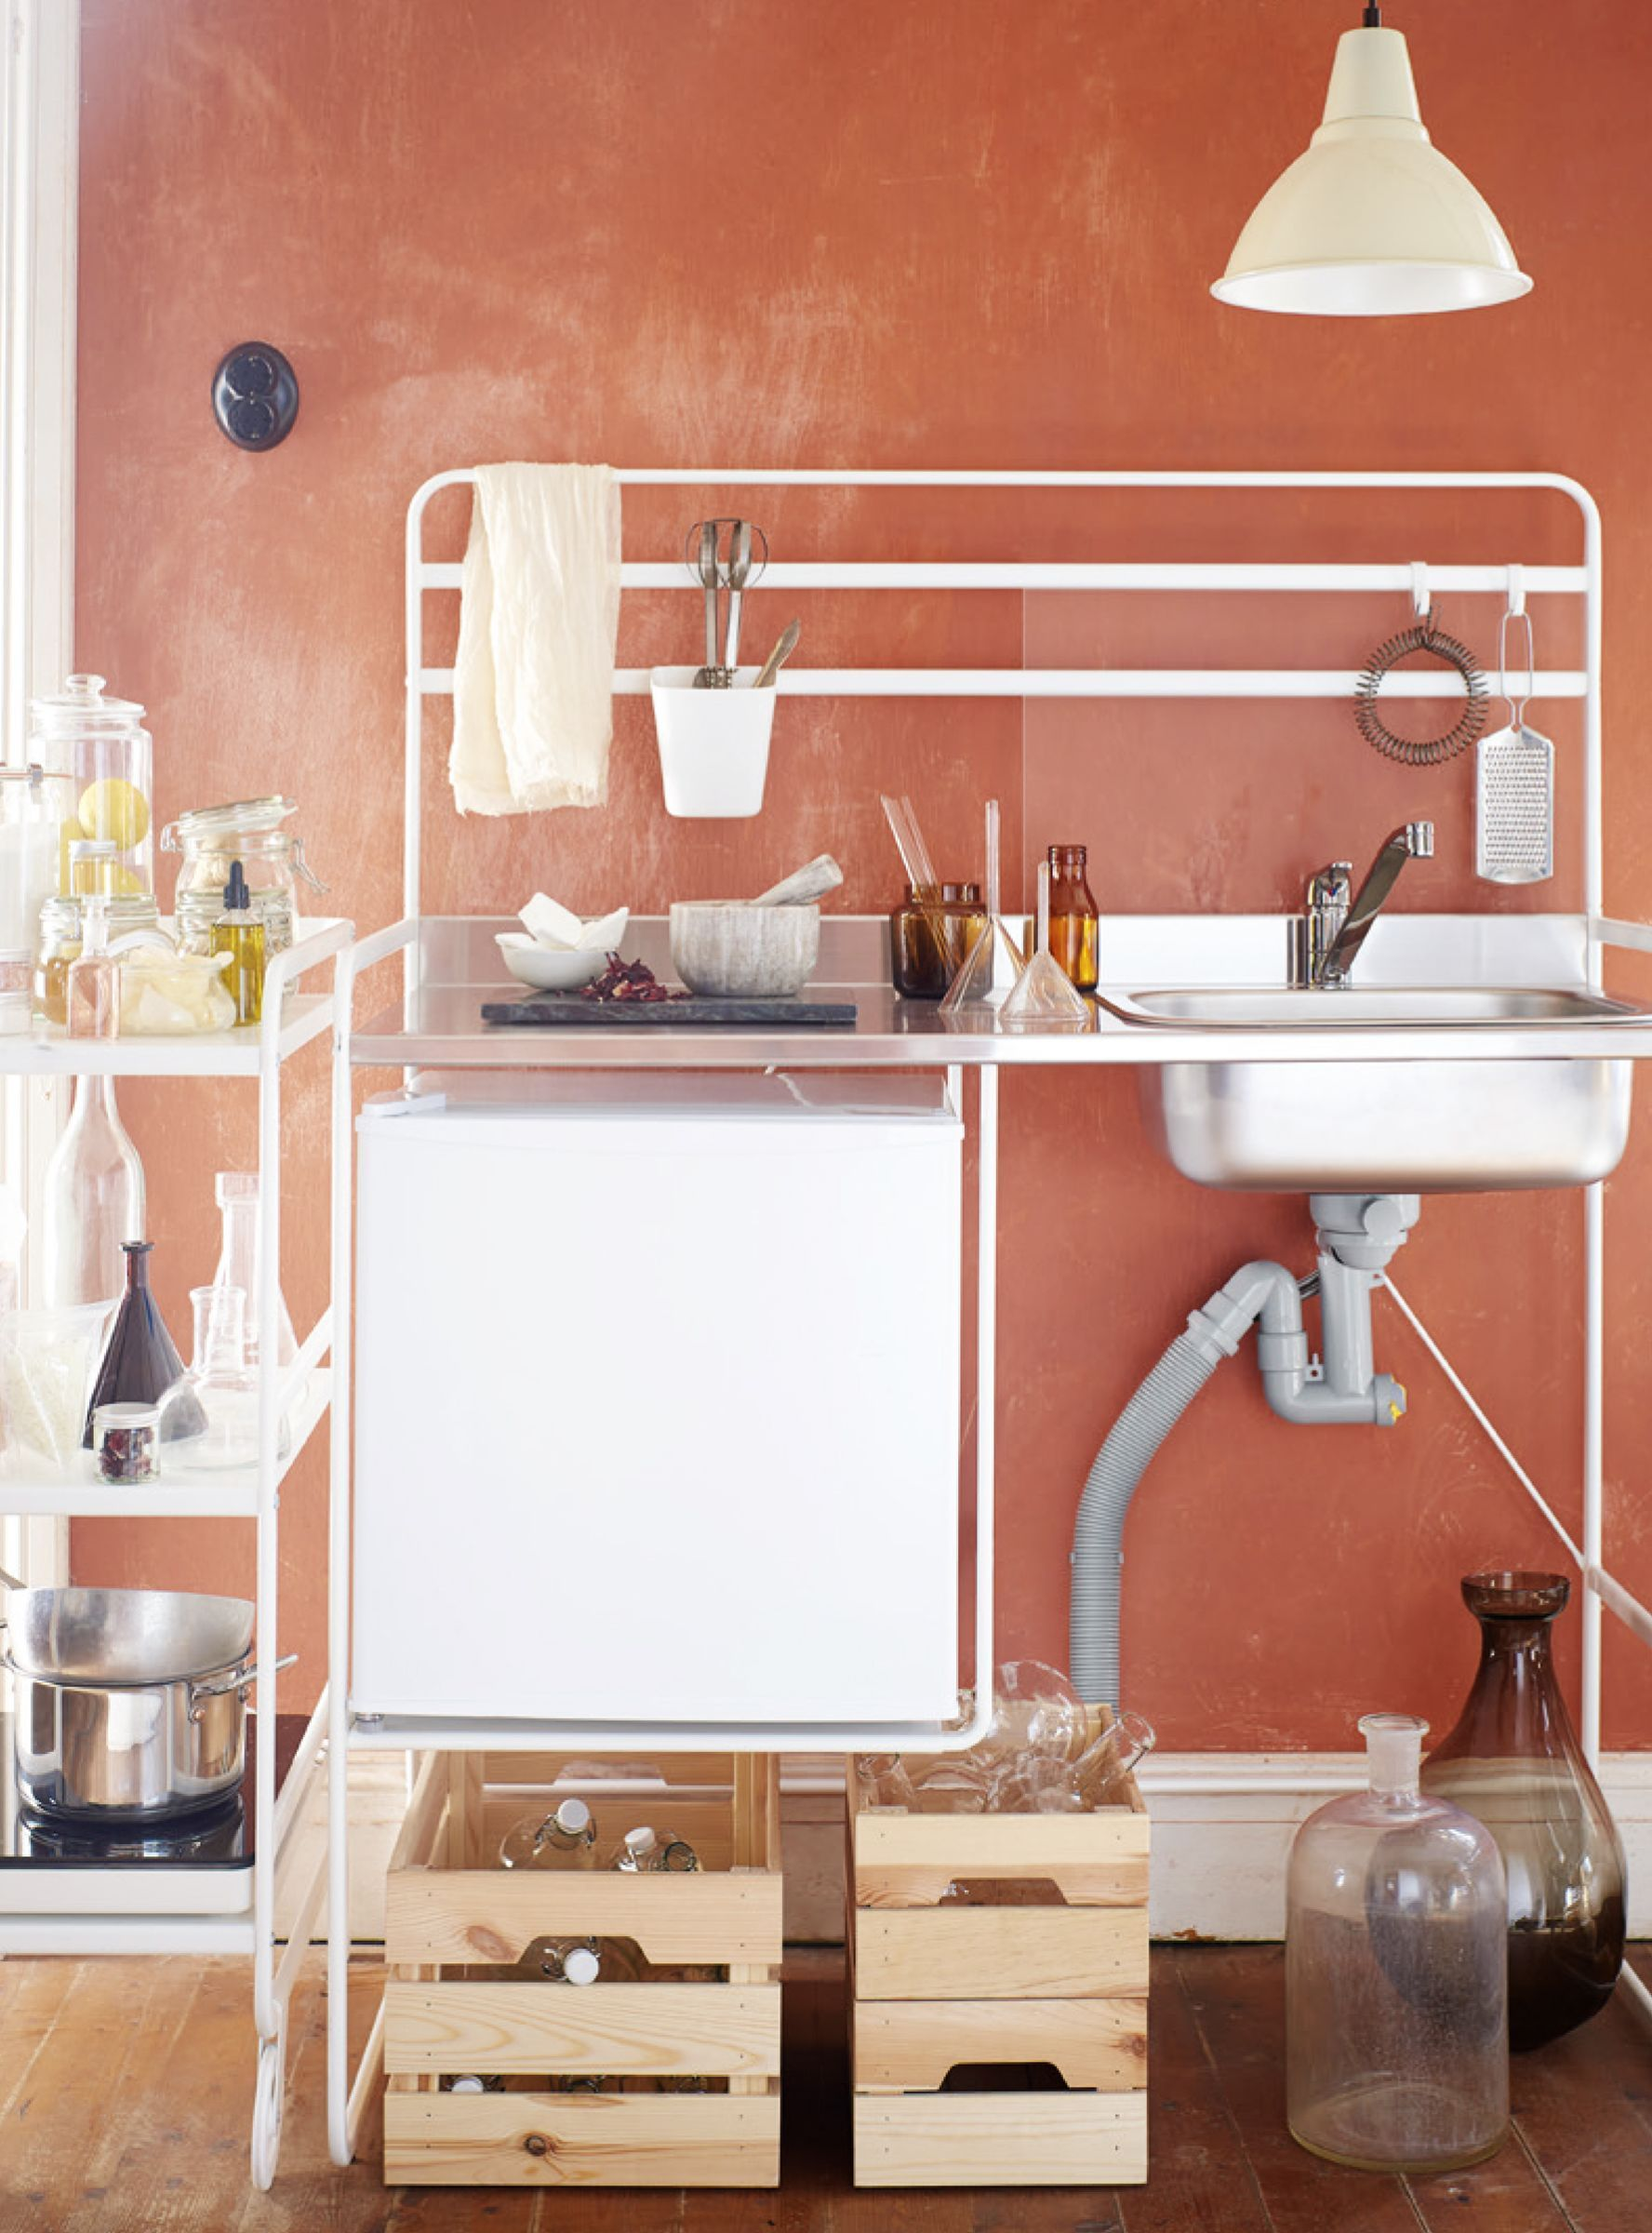 Get An Entire Ikea Mini Kitchen For Just 112 Mini Kitchen